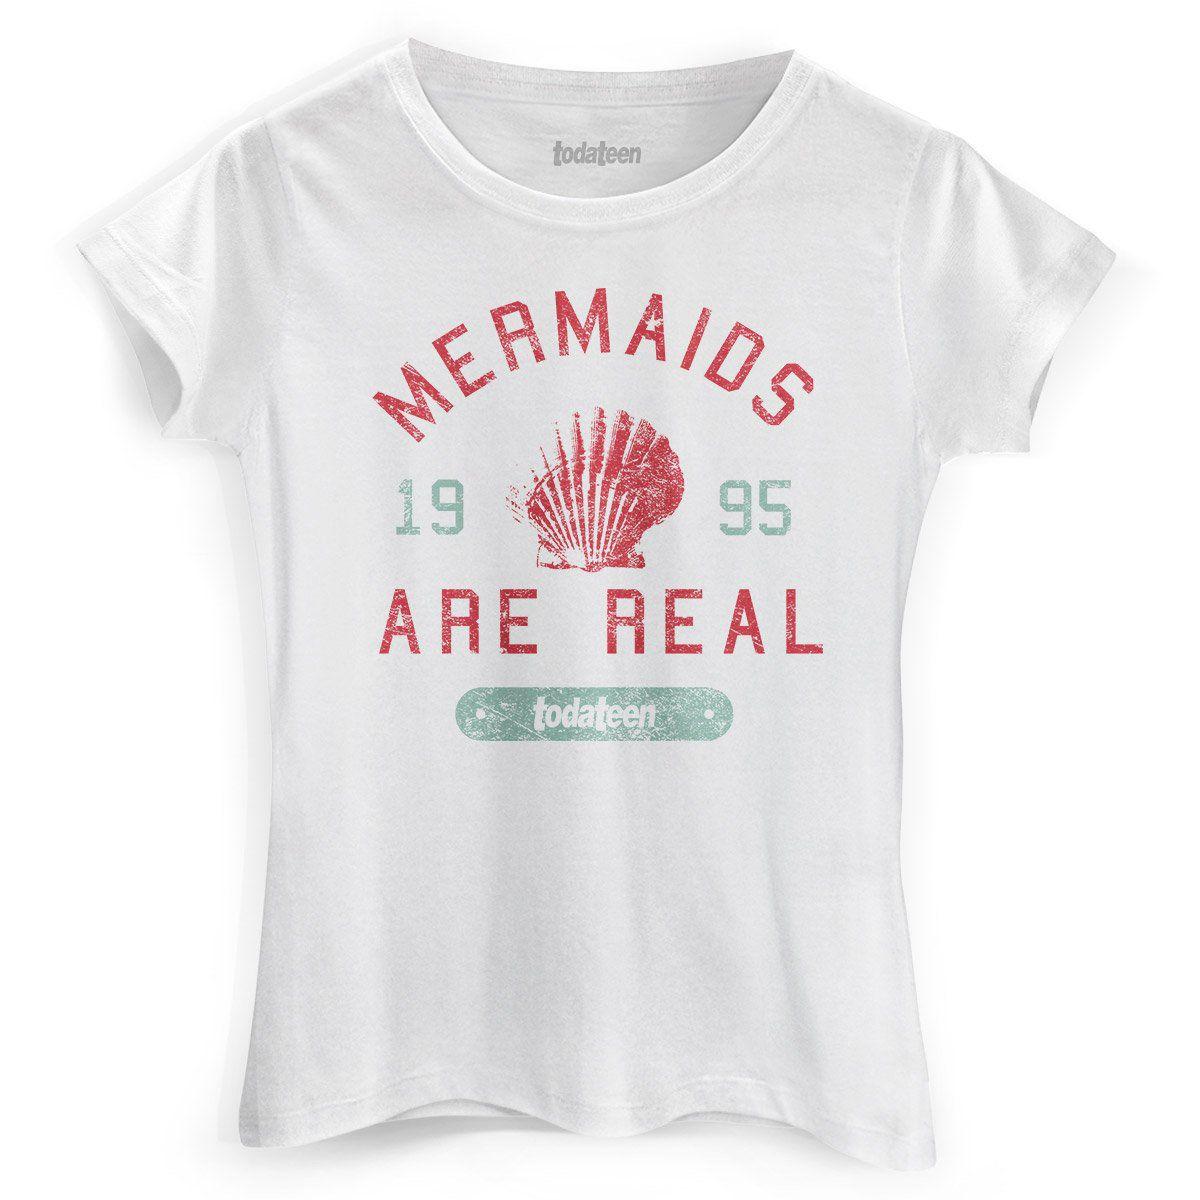 Camiseta Feminina TodaTeen Mermaids Are Real  - bandUP Store Marketplace